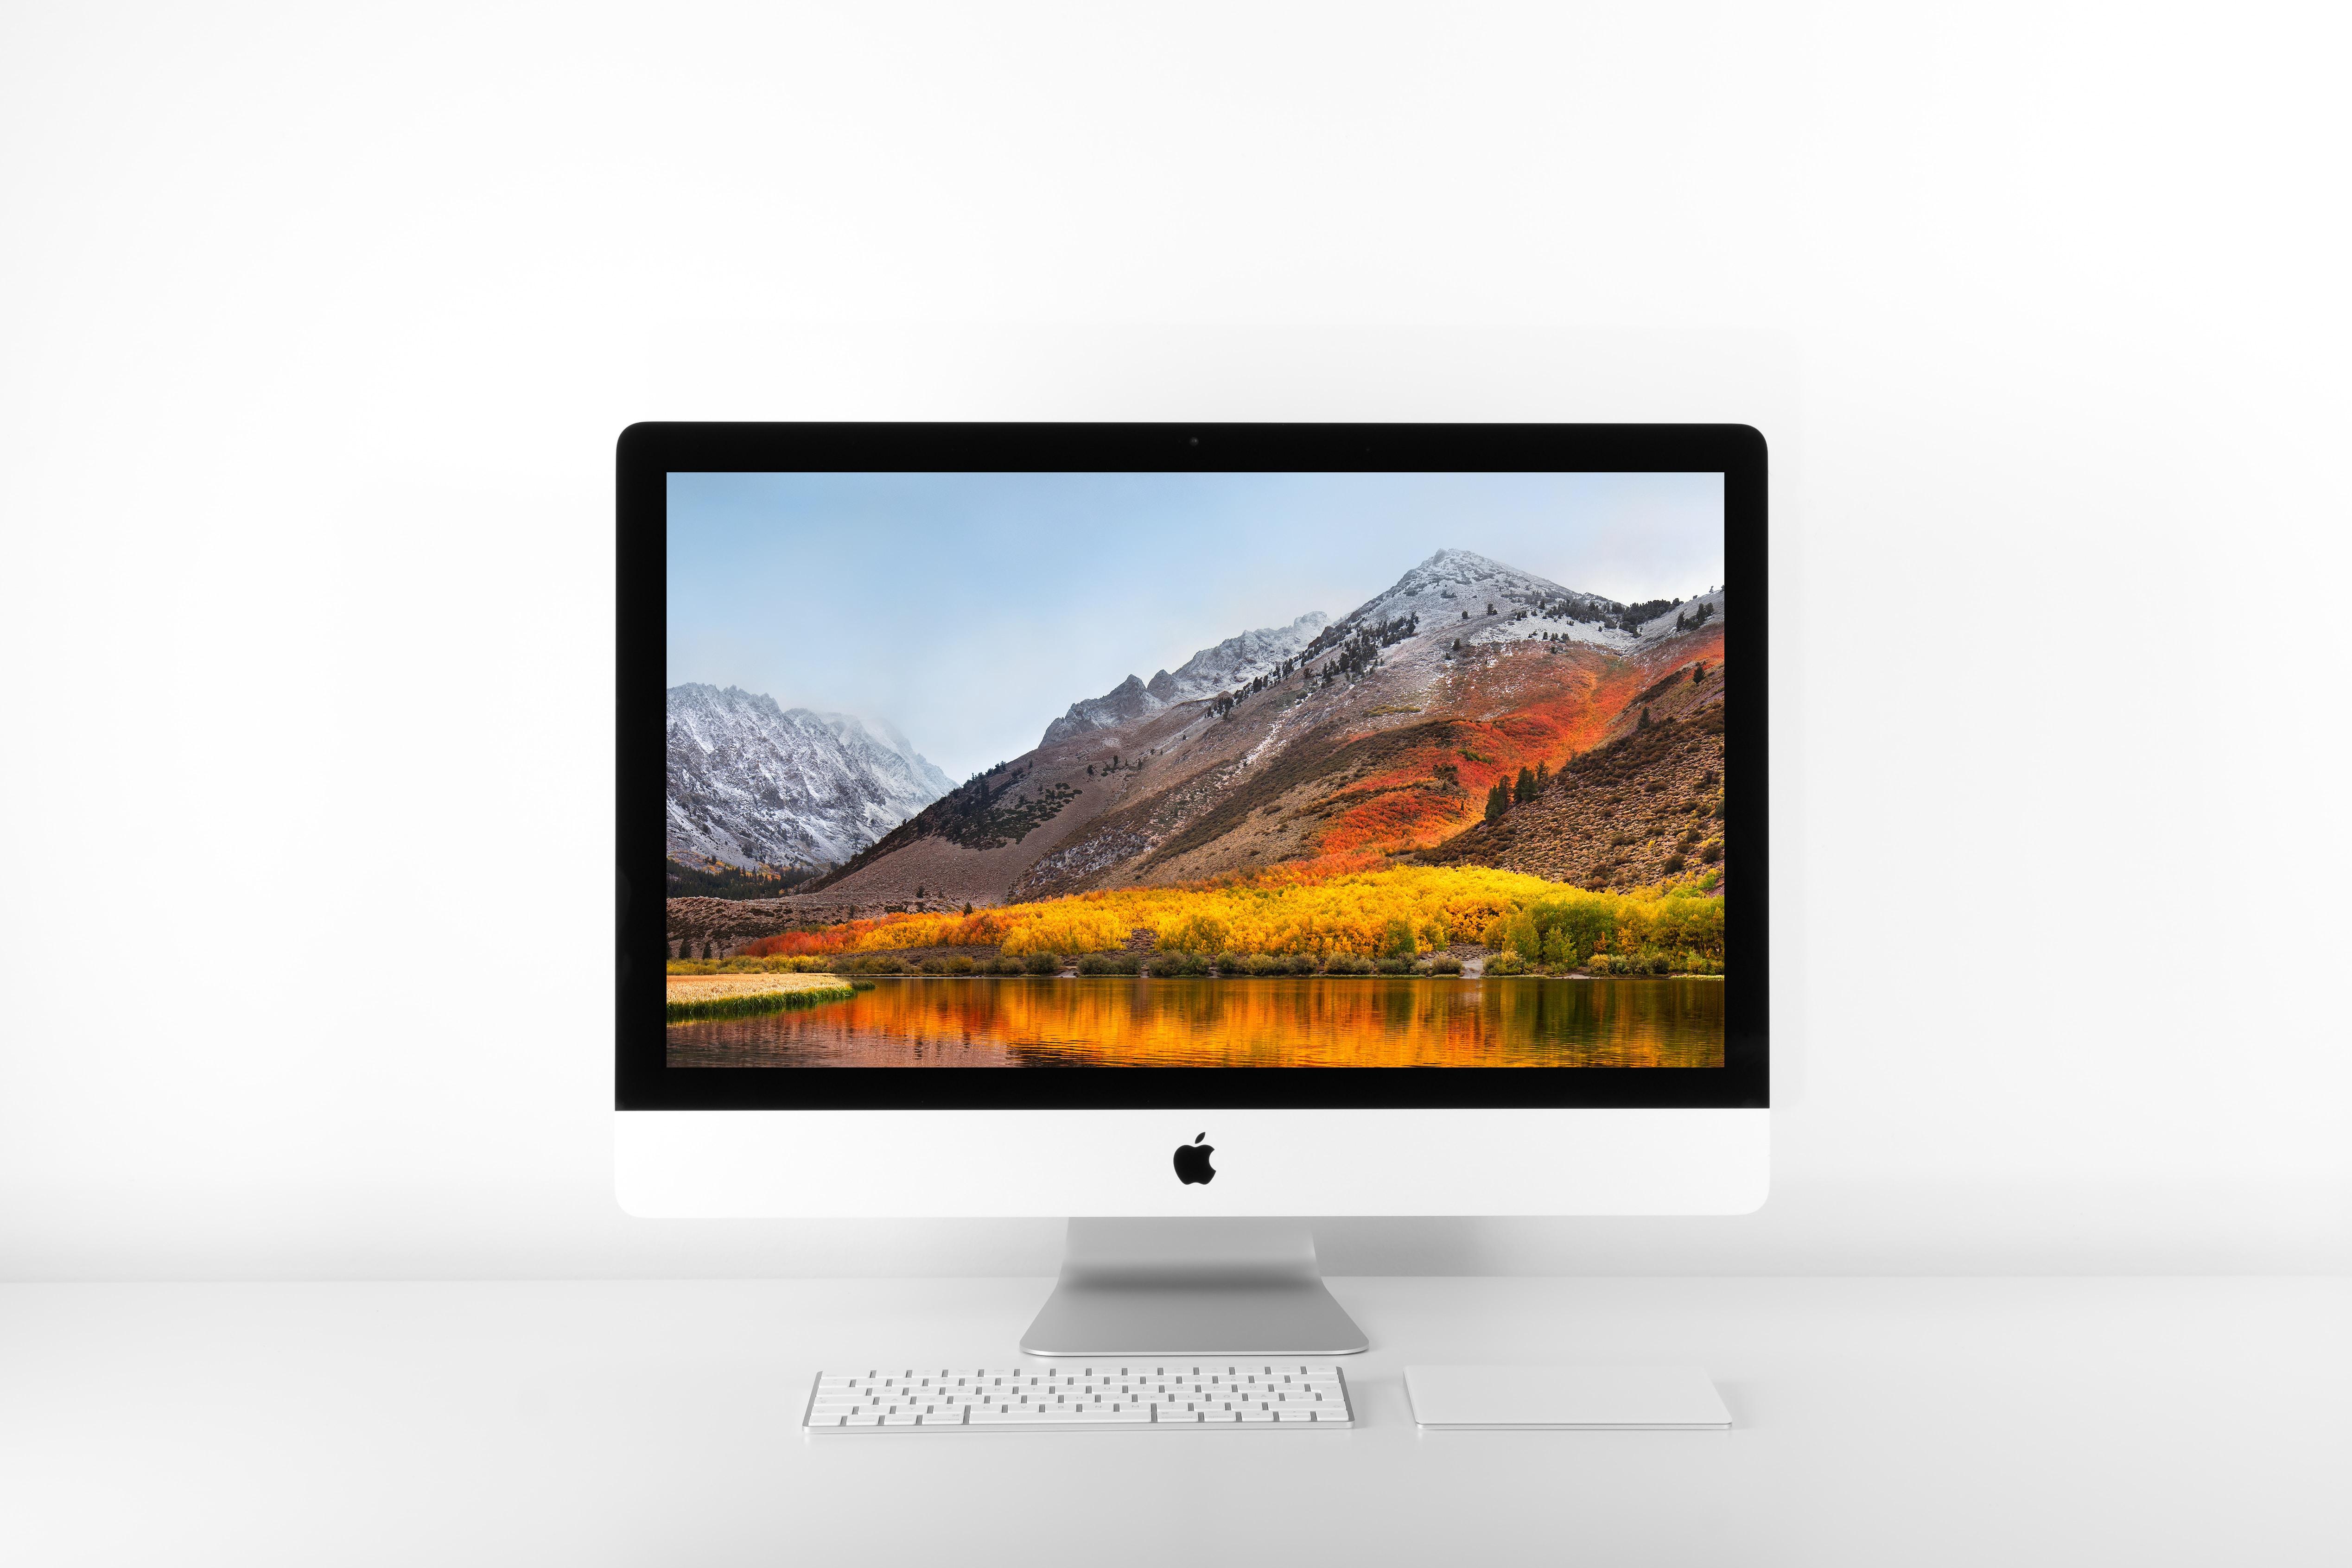 Computer screen image